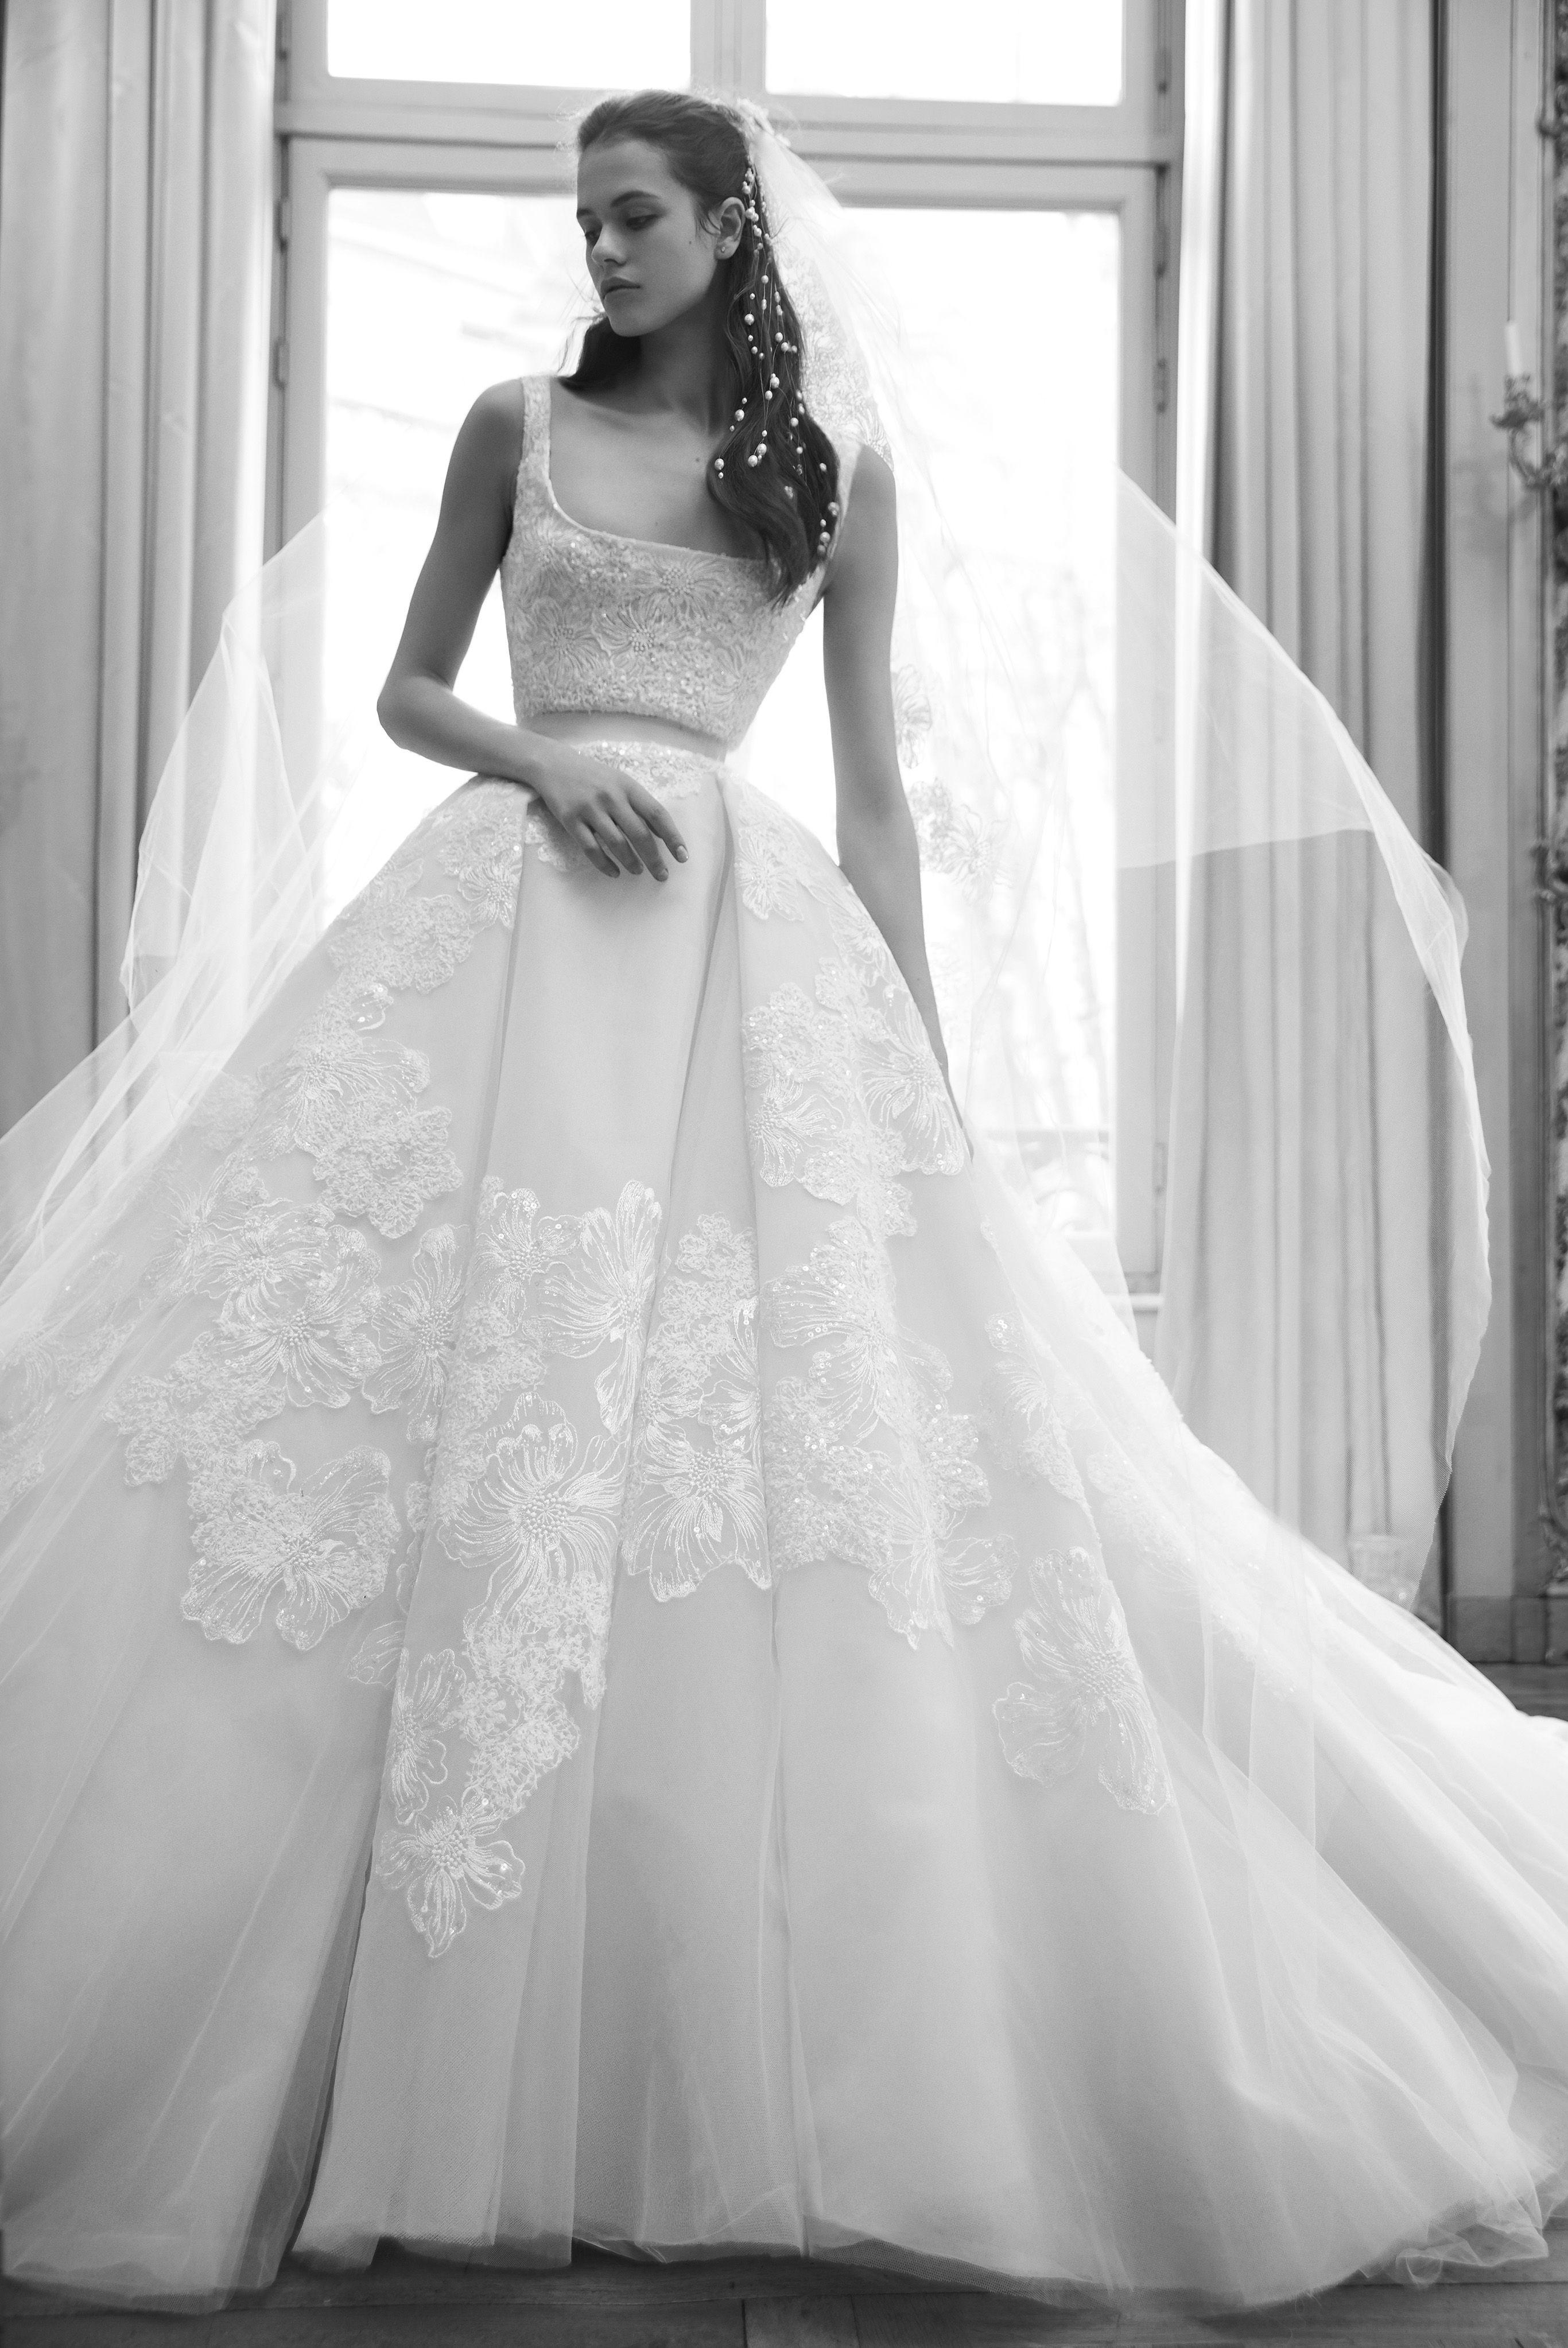 Elie Saab Ready To Wear Bridal Spring 2019 Elie Saab Wedding Dress Elie Saab Bridal Bridal Couture